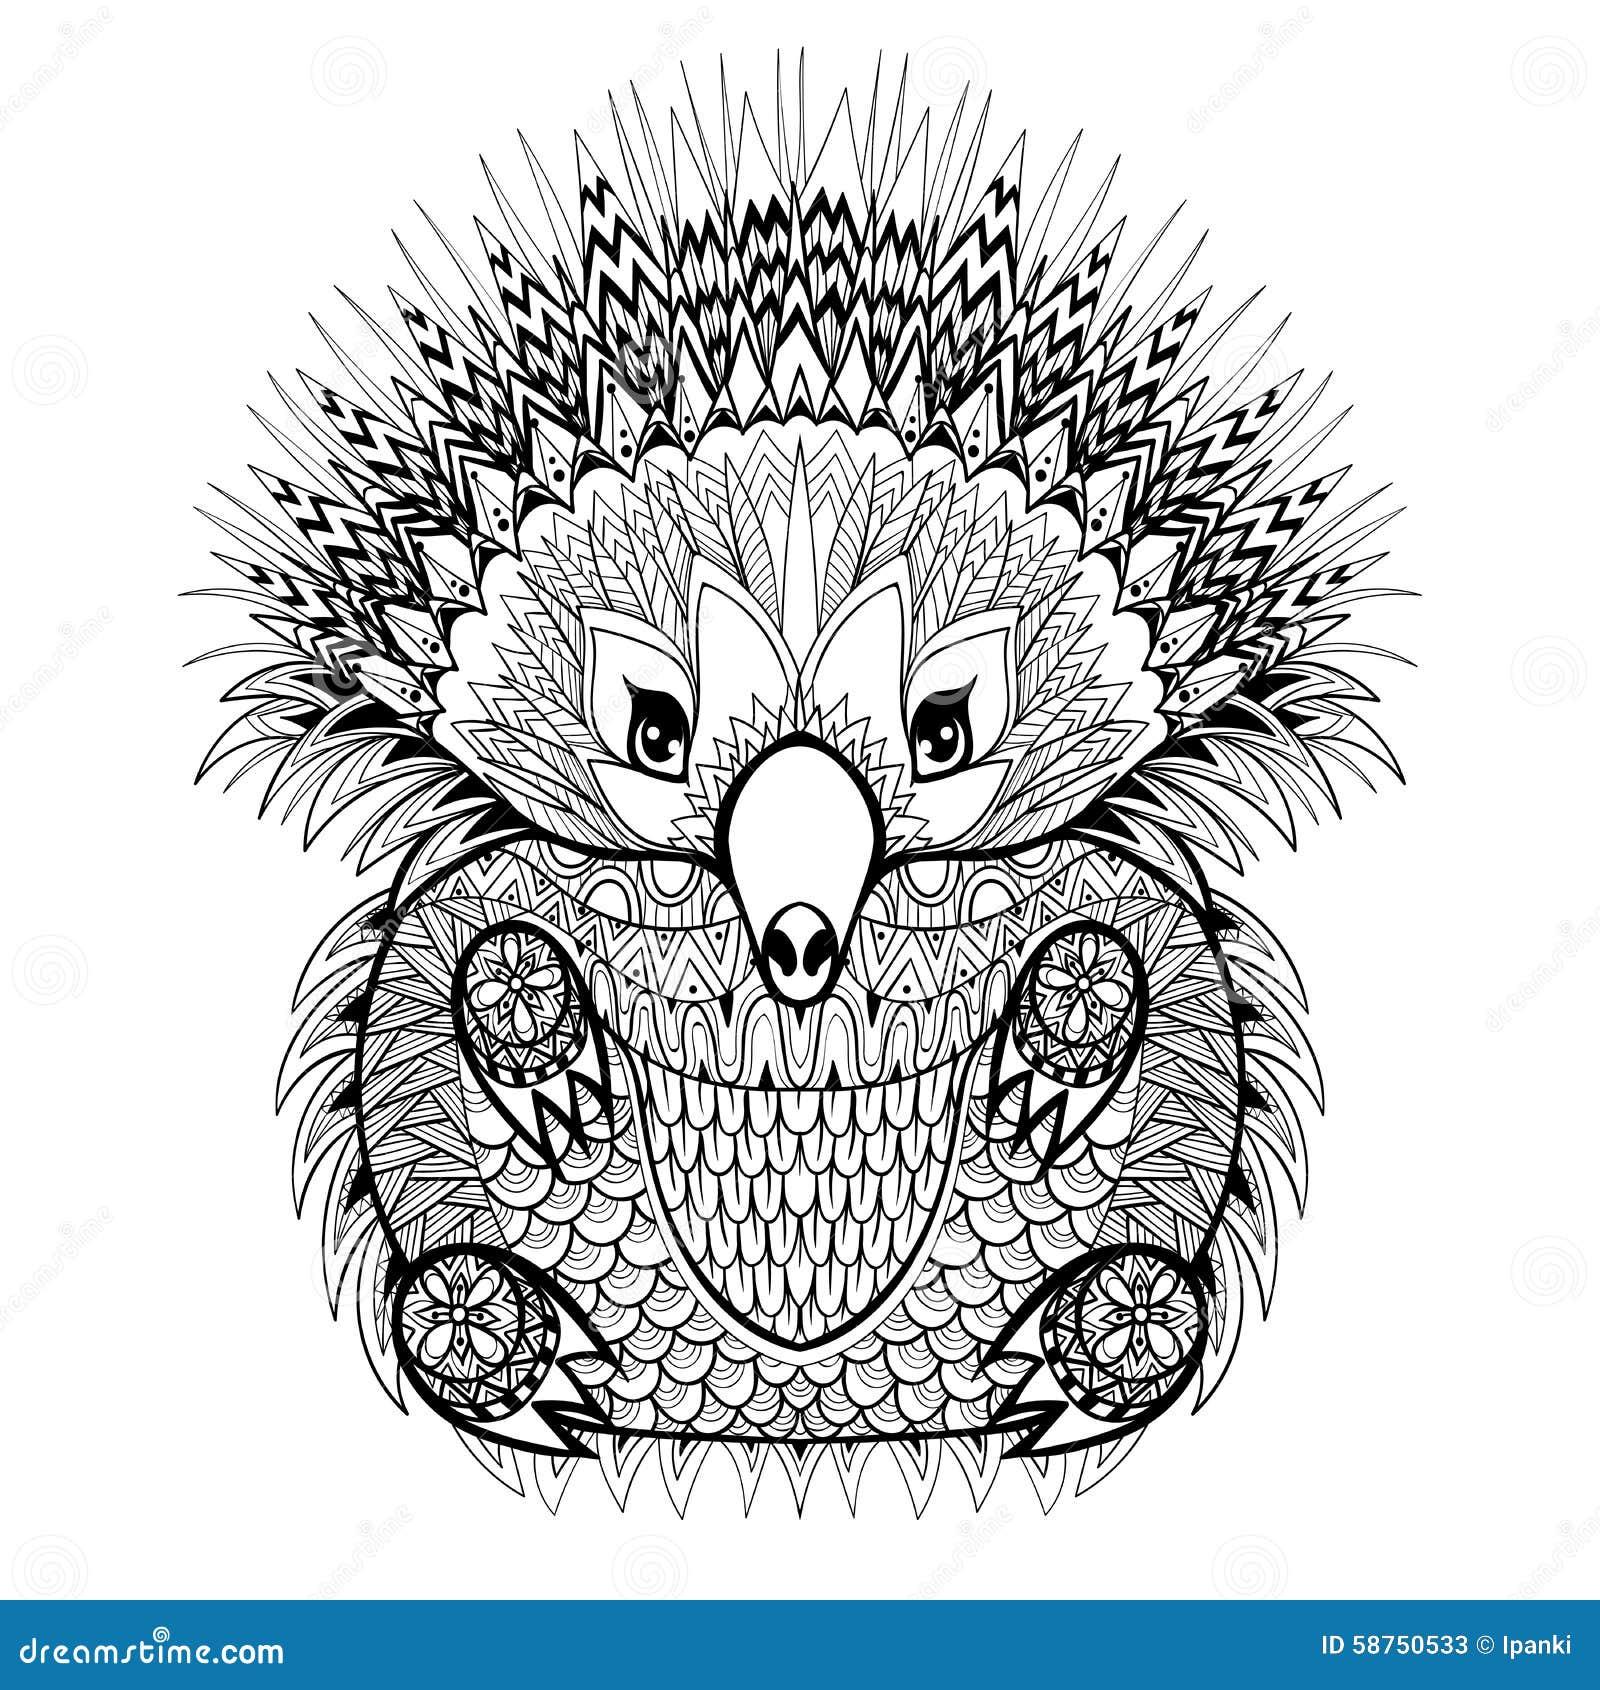 Hand Drawn Echidna Australian Animal Illustration For